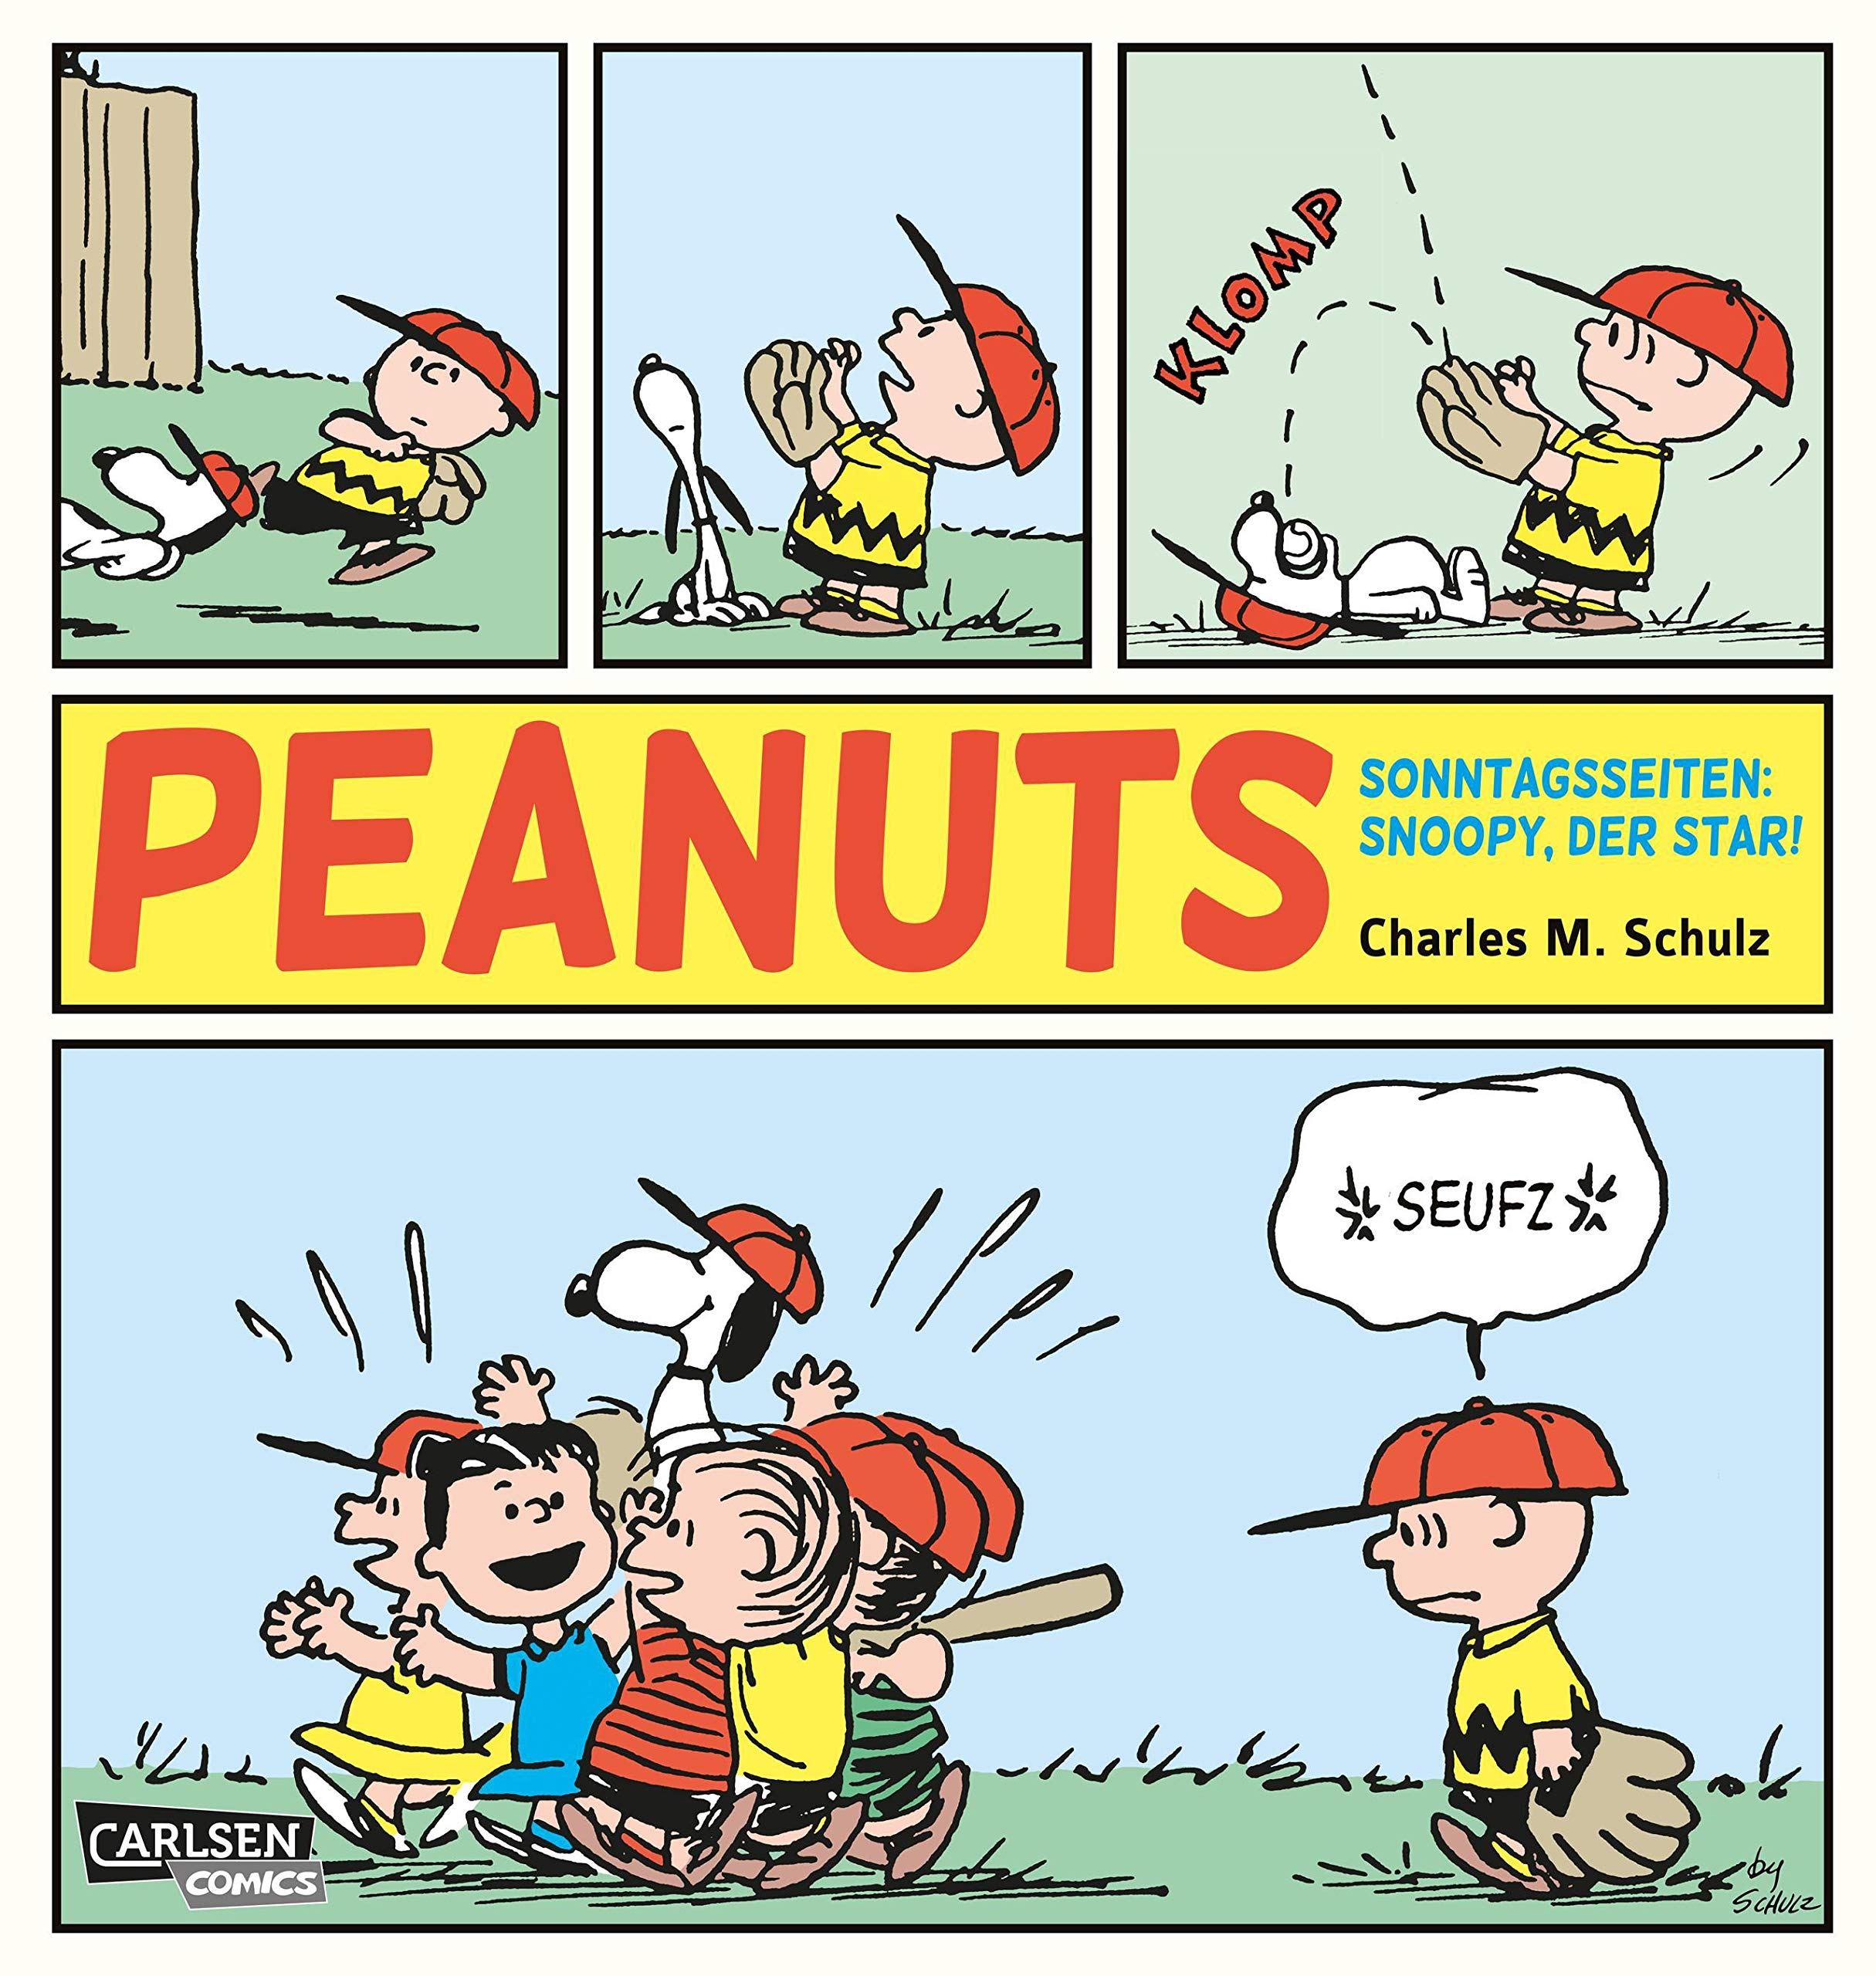 Peanuts Sonntagsseiten 1  Peanuts  Snoopy Der Star   1